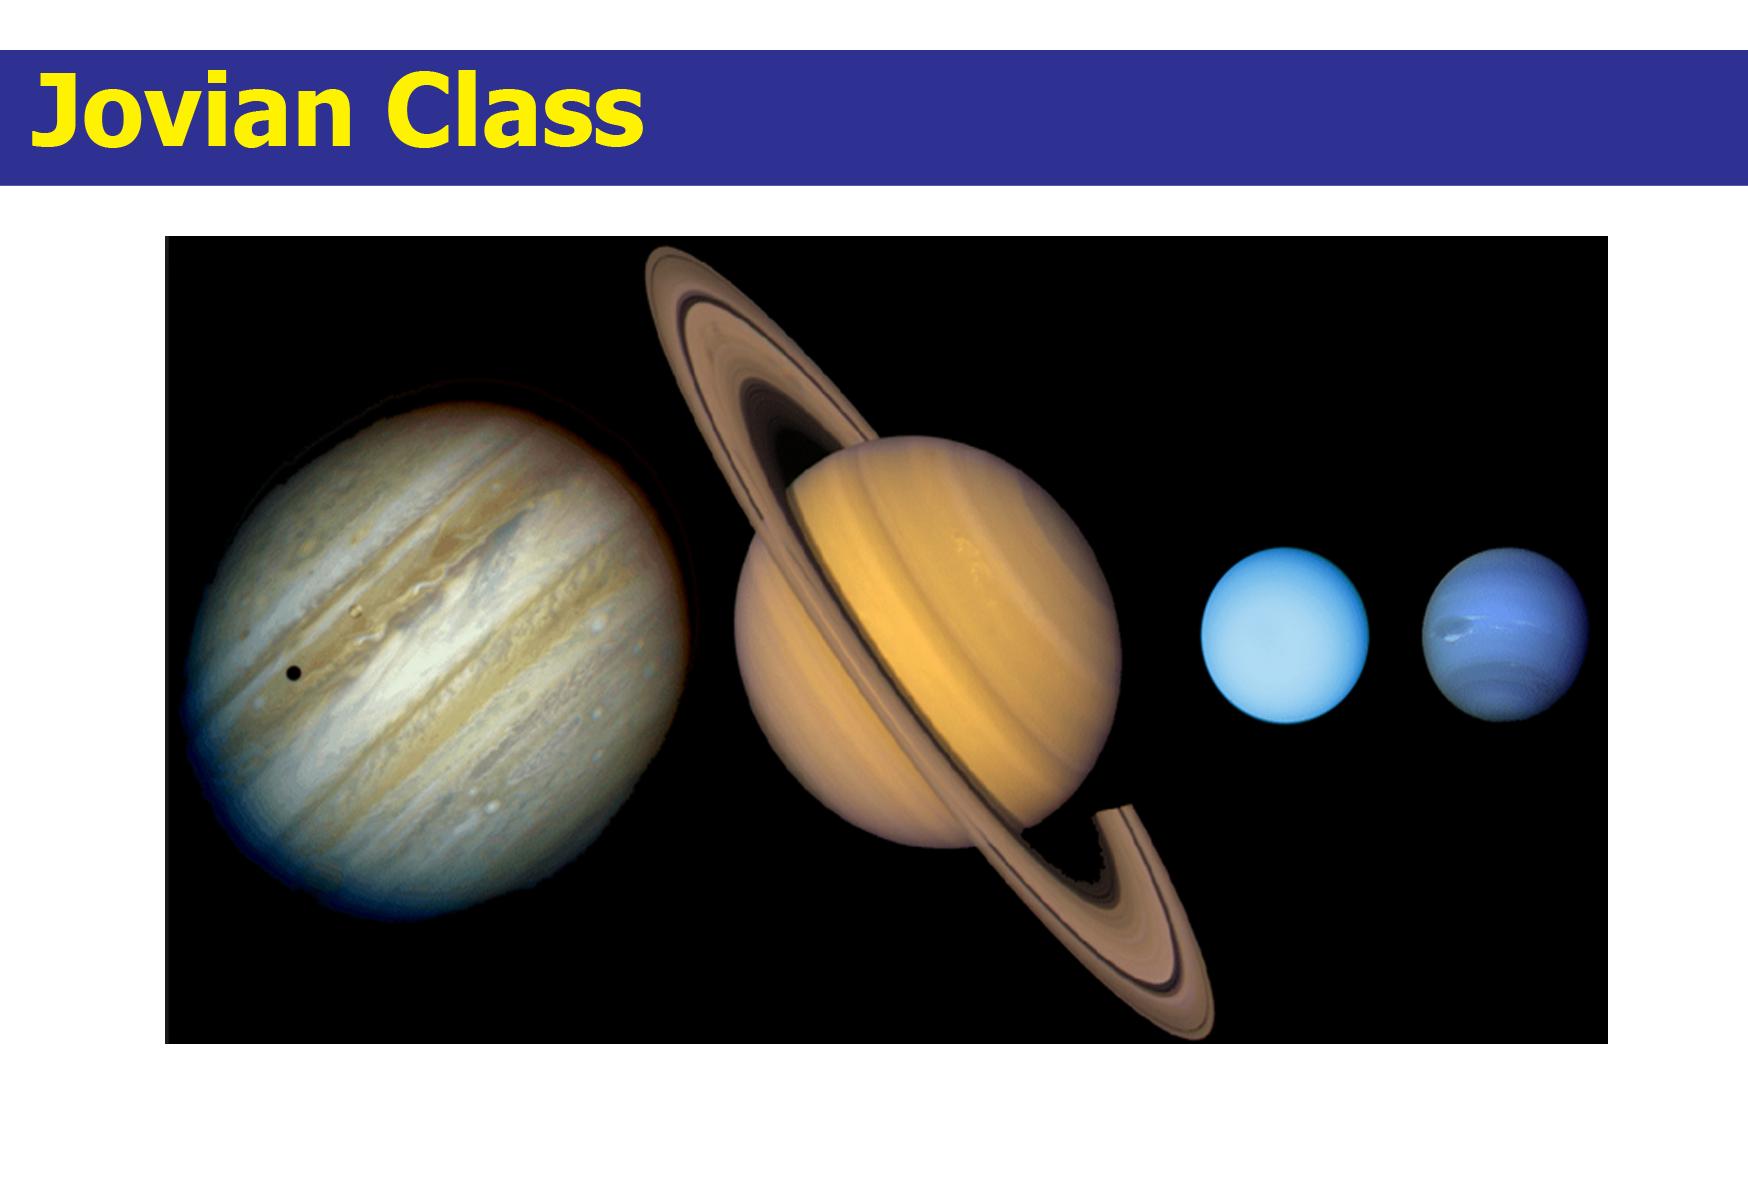 Jovian Class